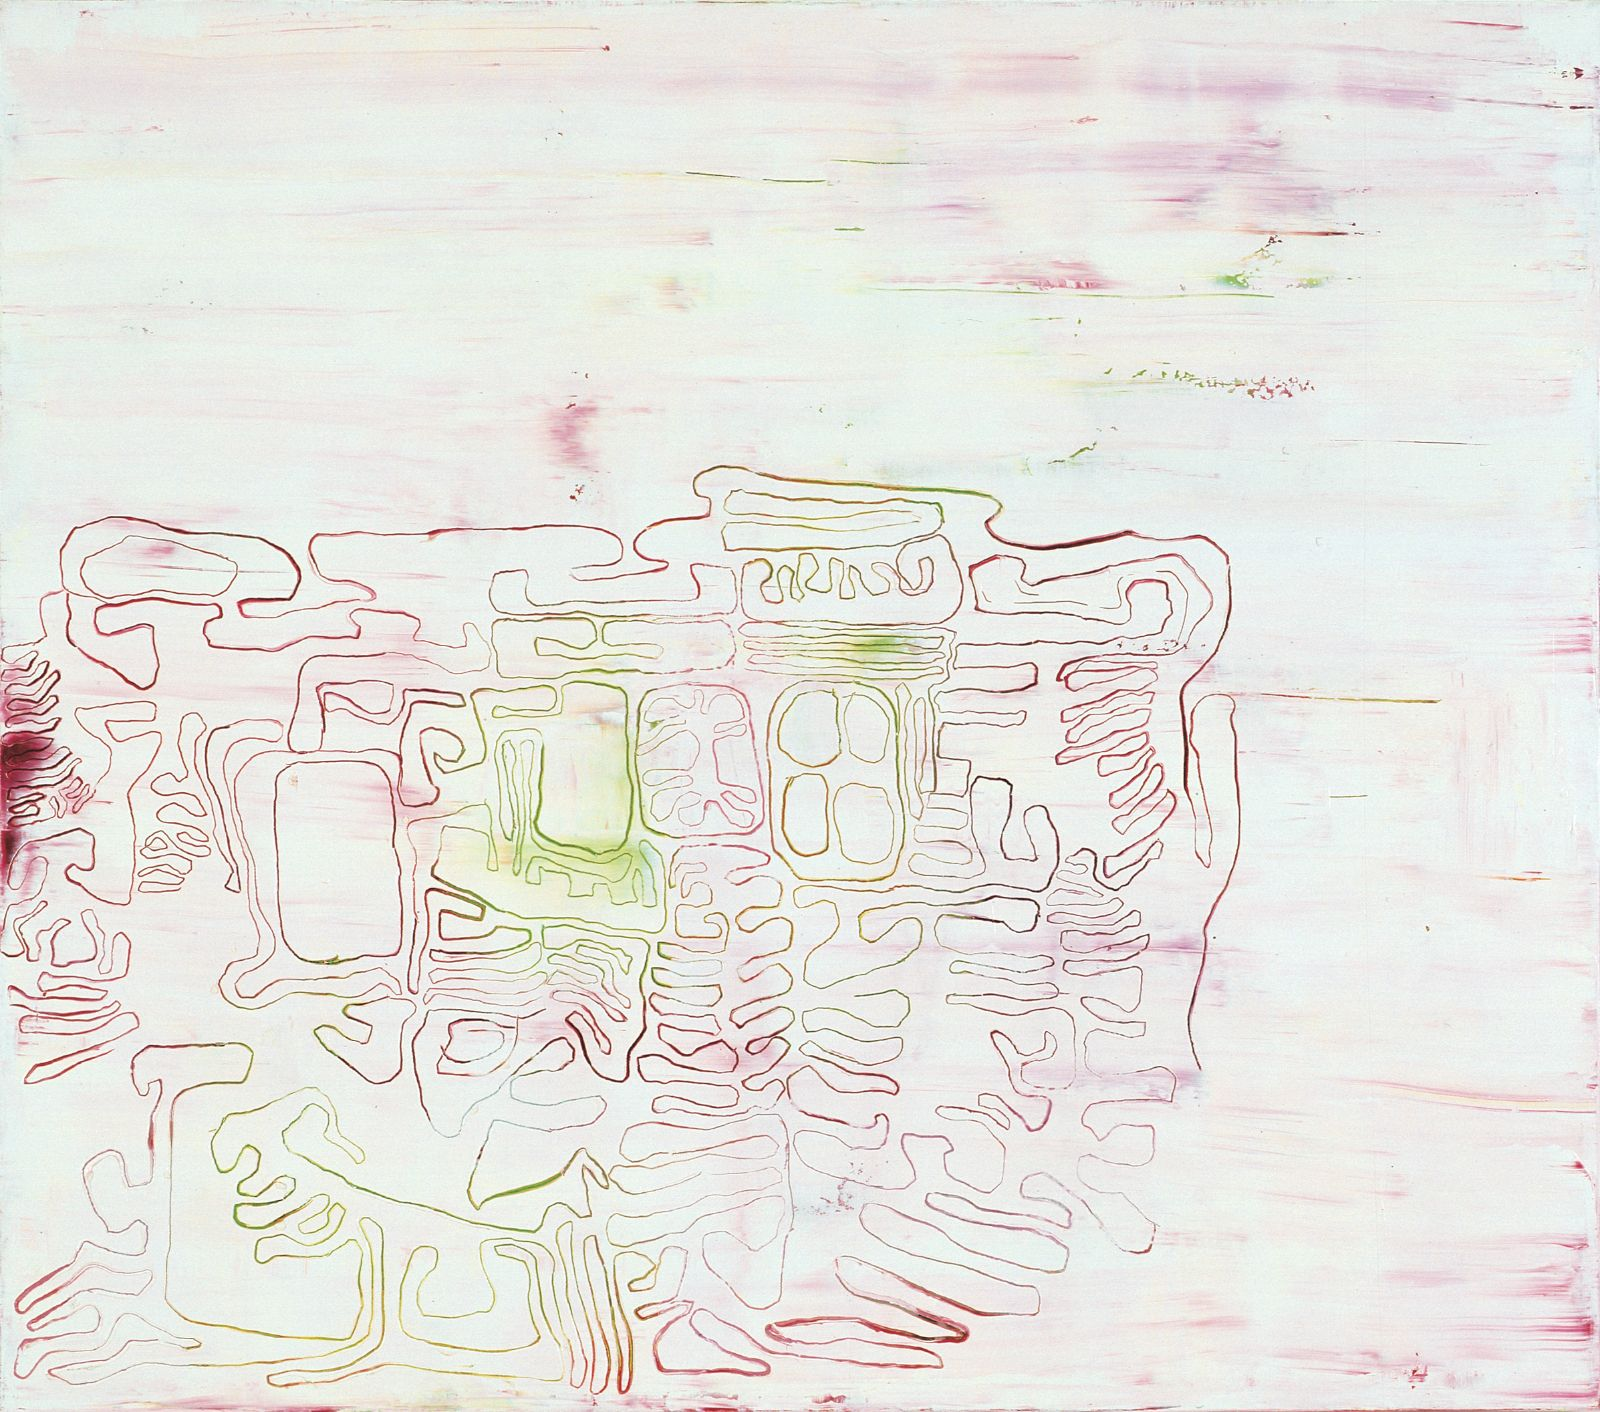 Innocence No. 17, 1999, oil on canvas, 145 x 165 cm